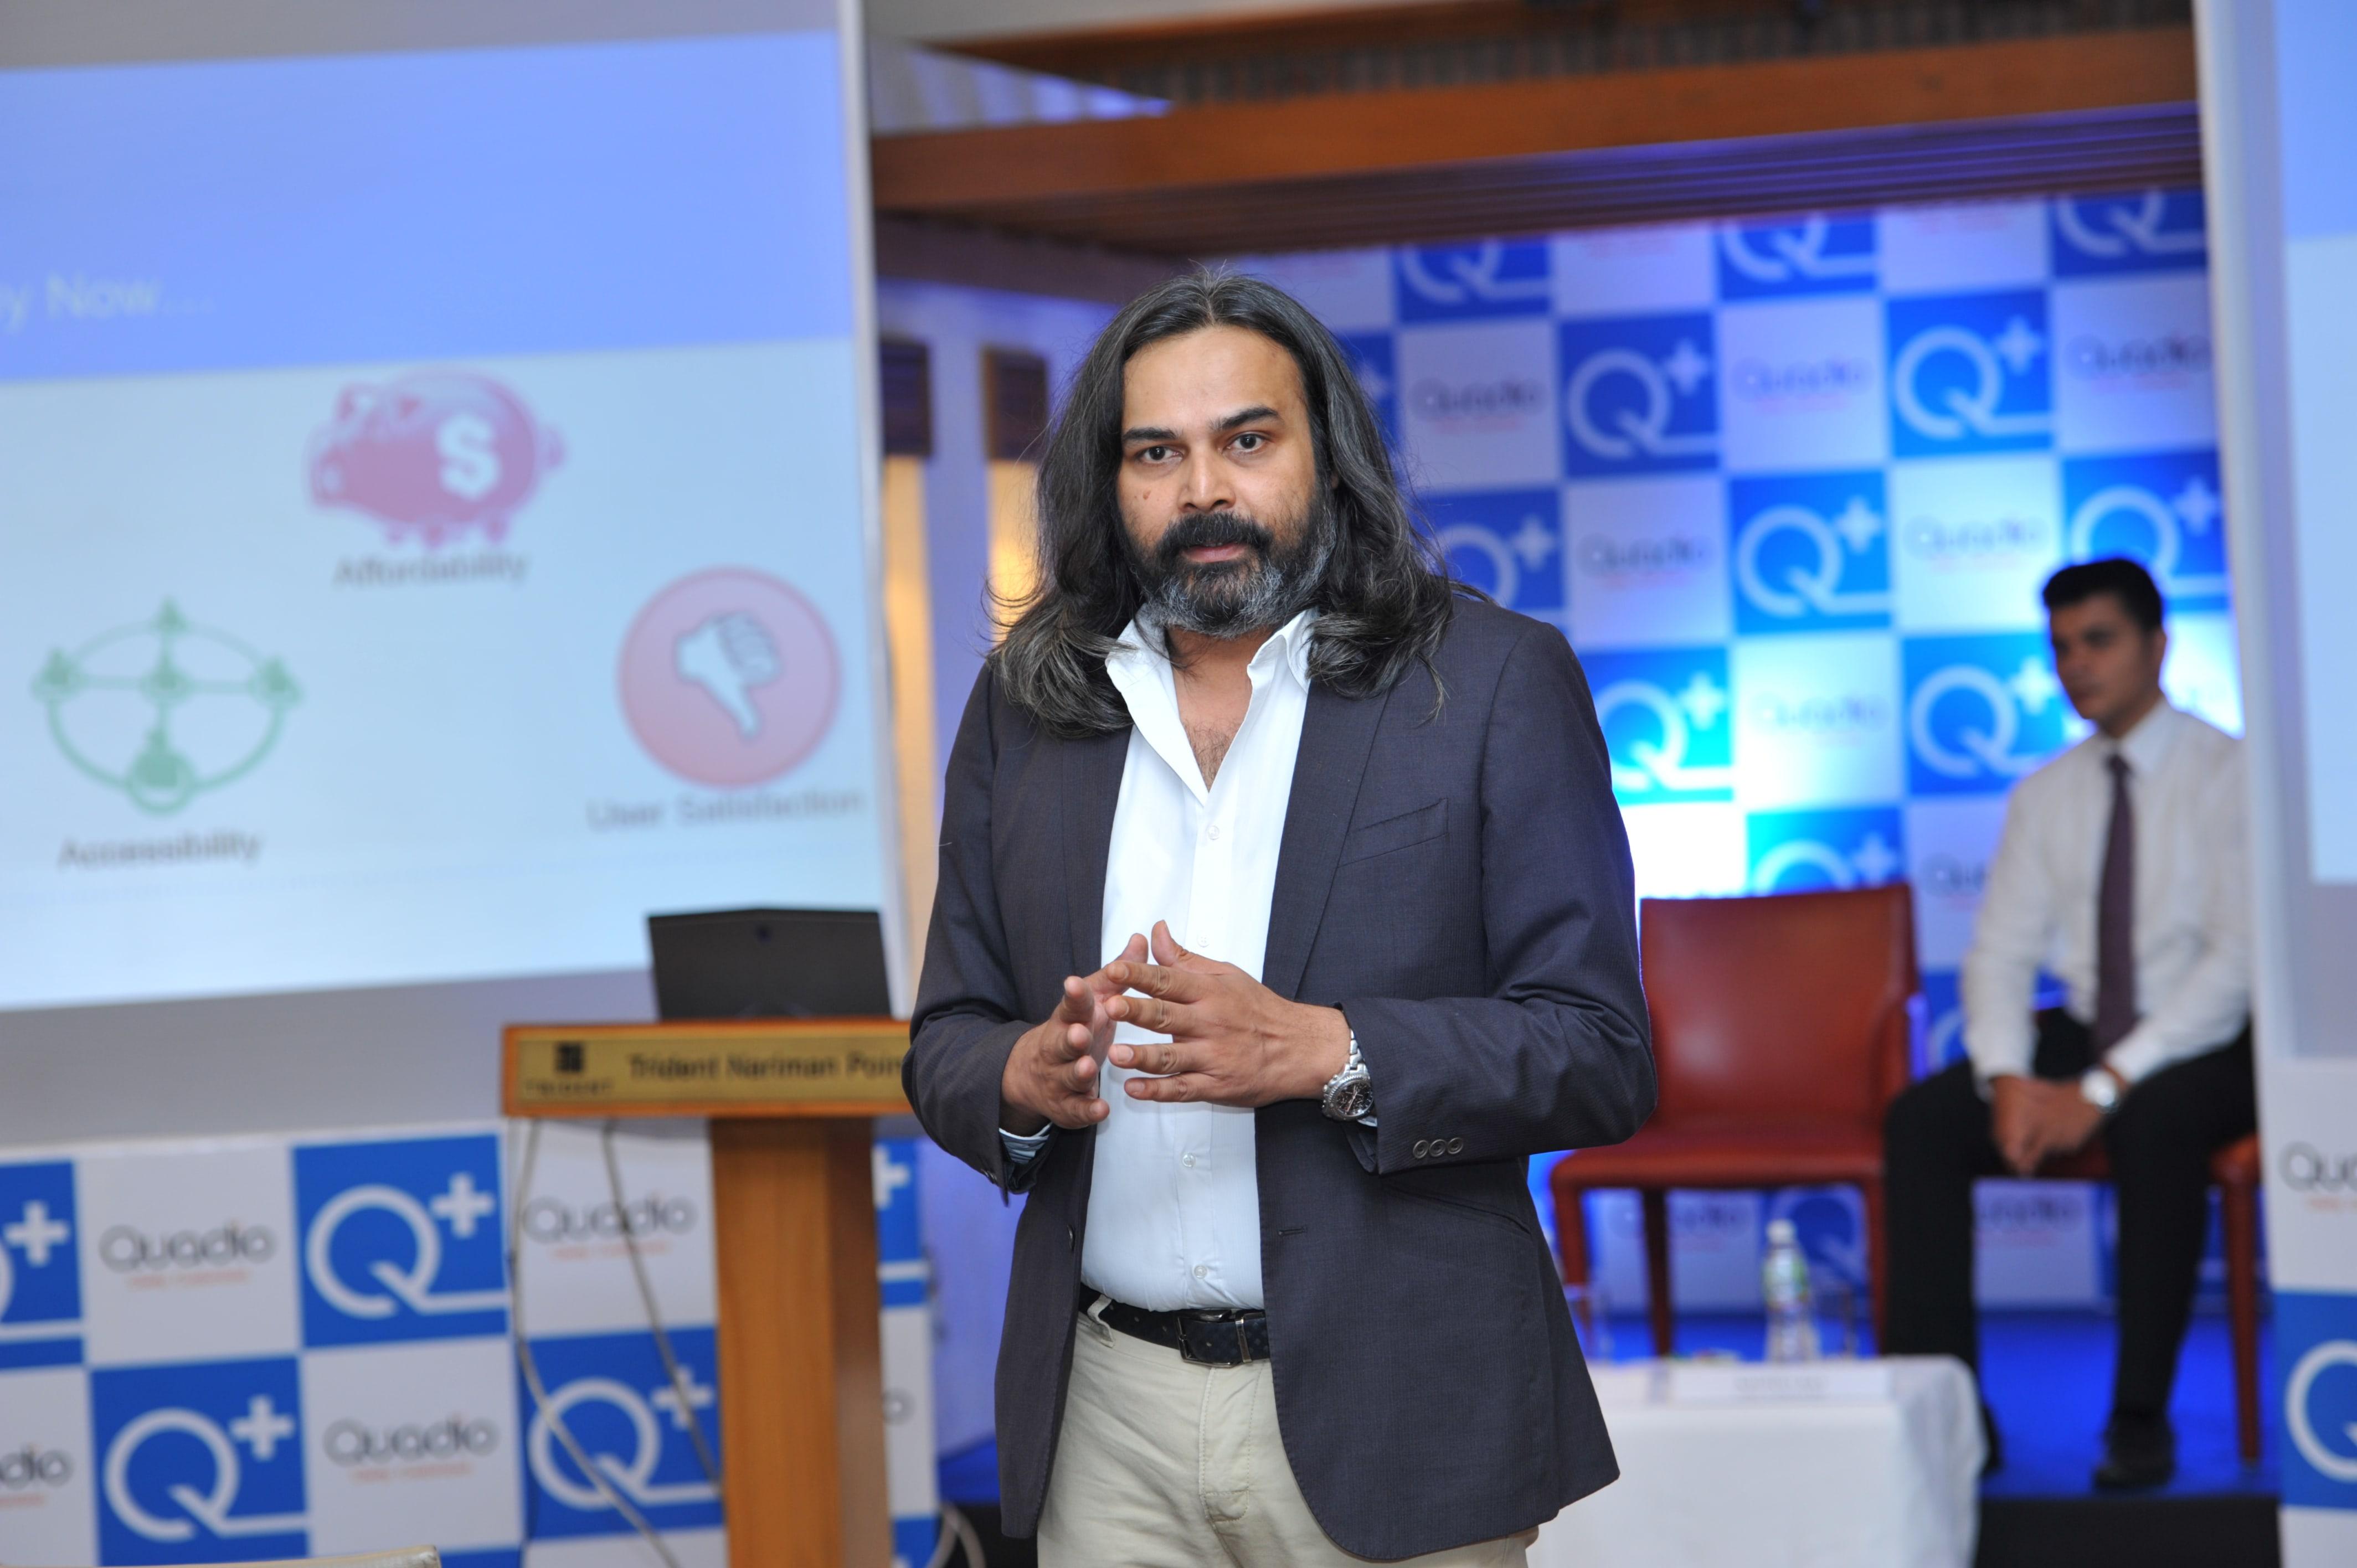 Neeraj Dotel  CEO  Quadio Devices Pvt Ltd